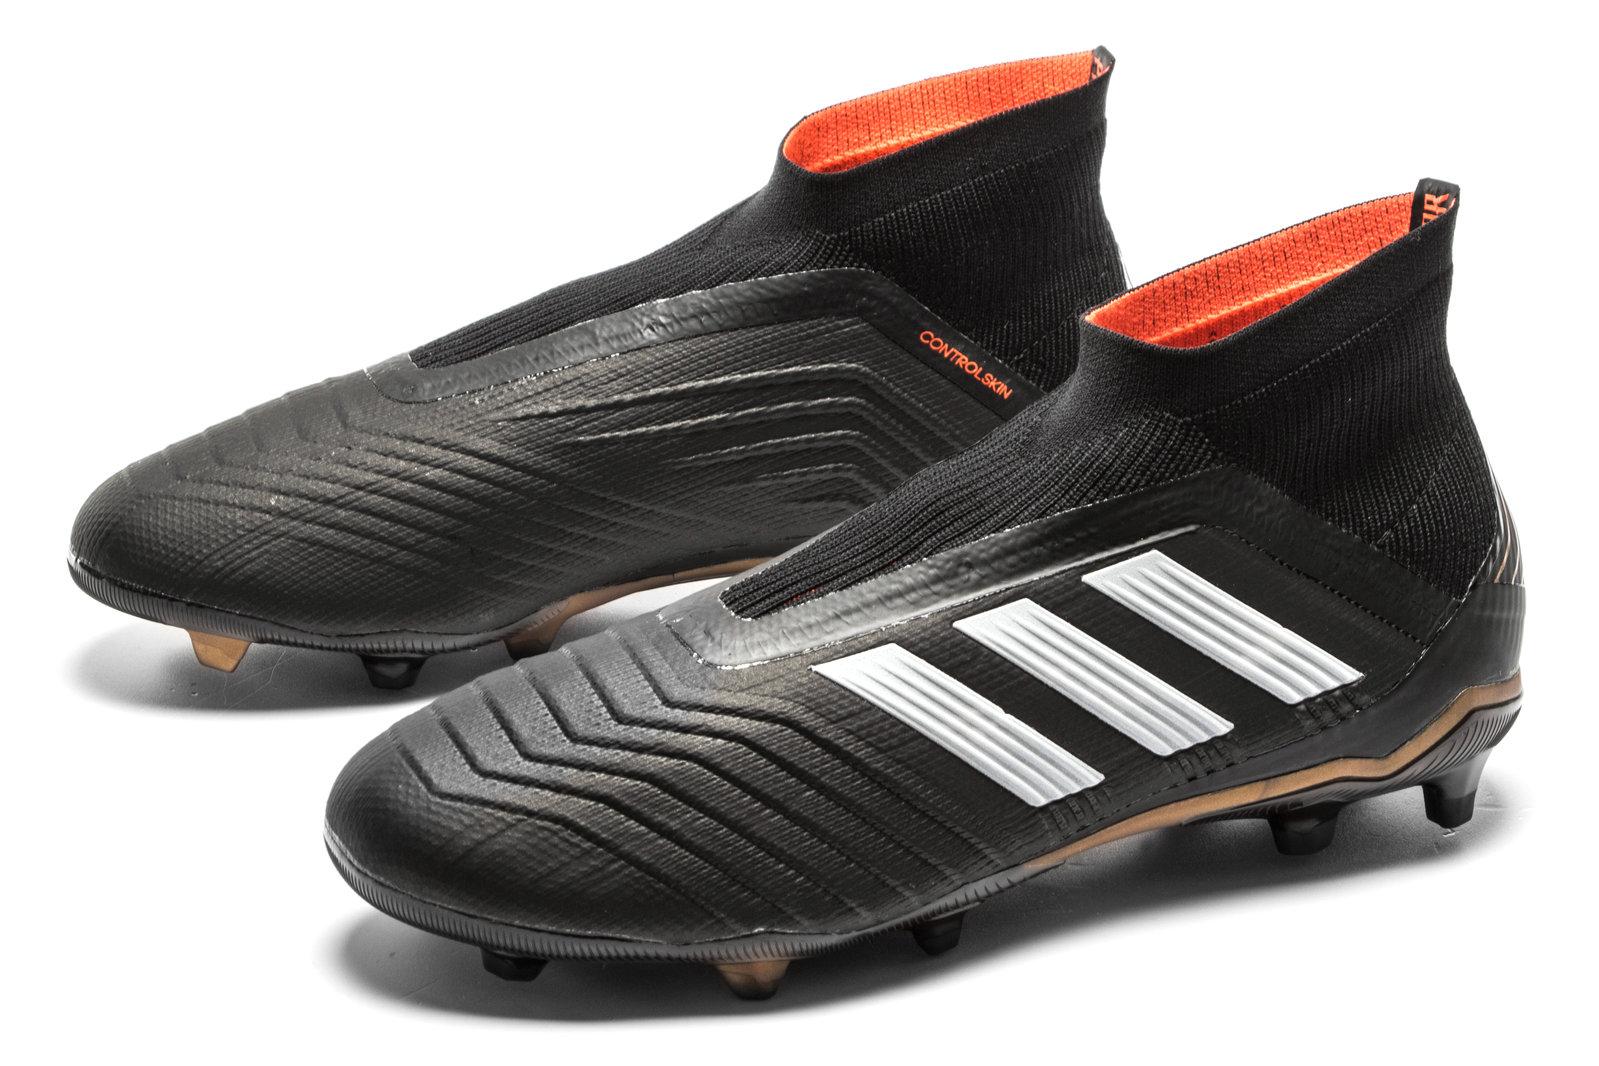 Adidas Predator Barna Laceless UK5c8d